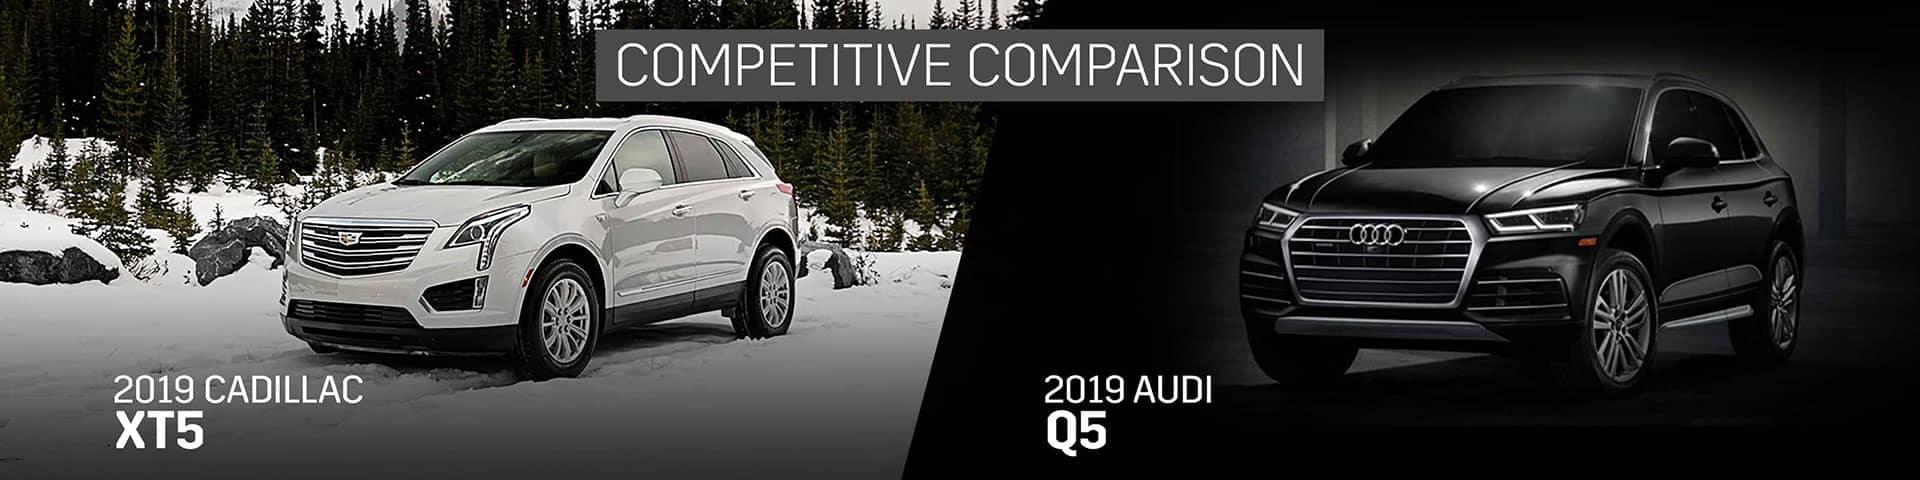 10-compare-2019-cadillac-xt5